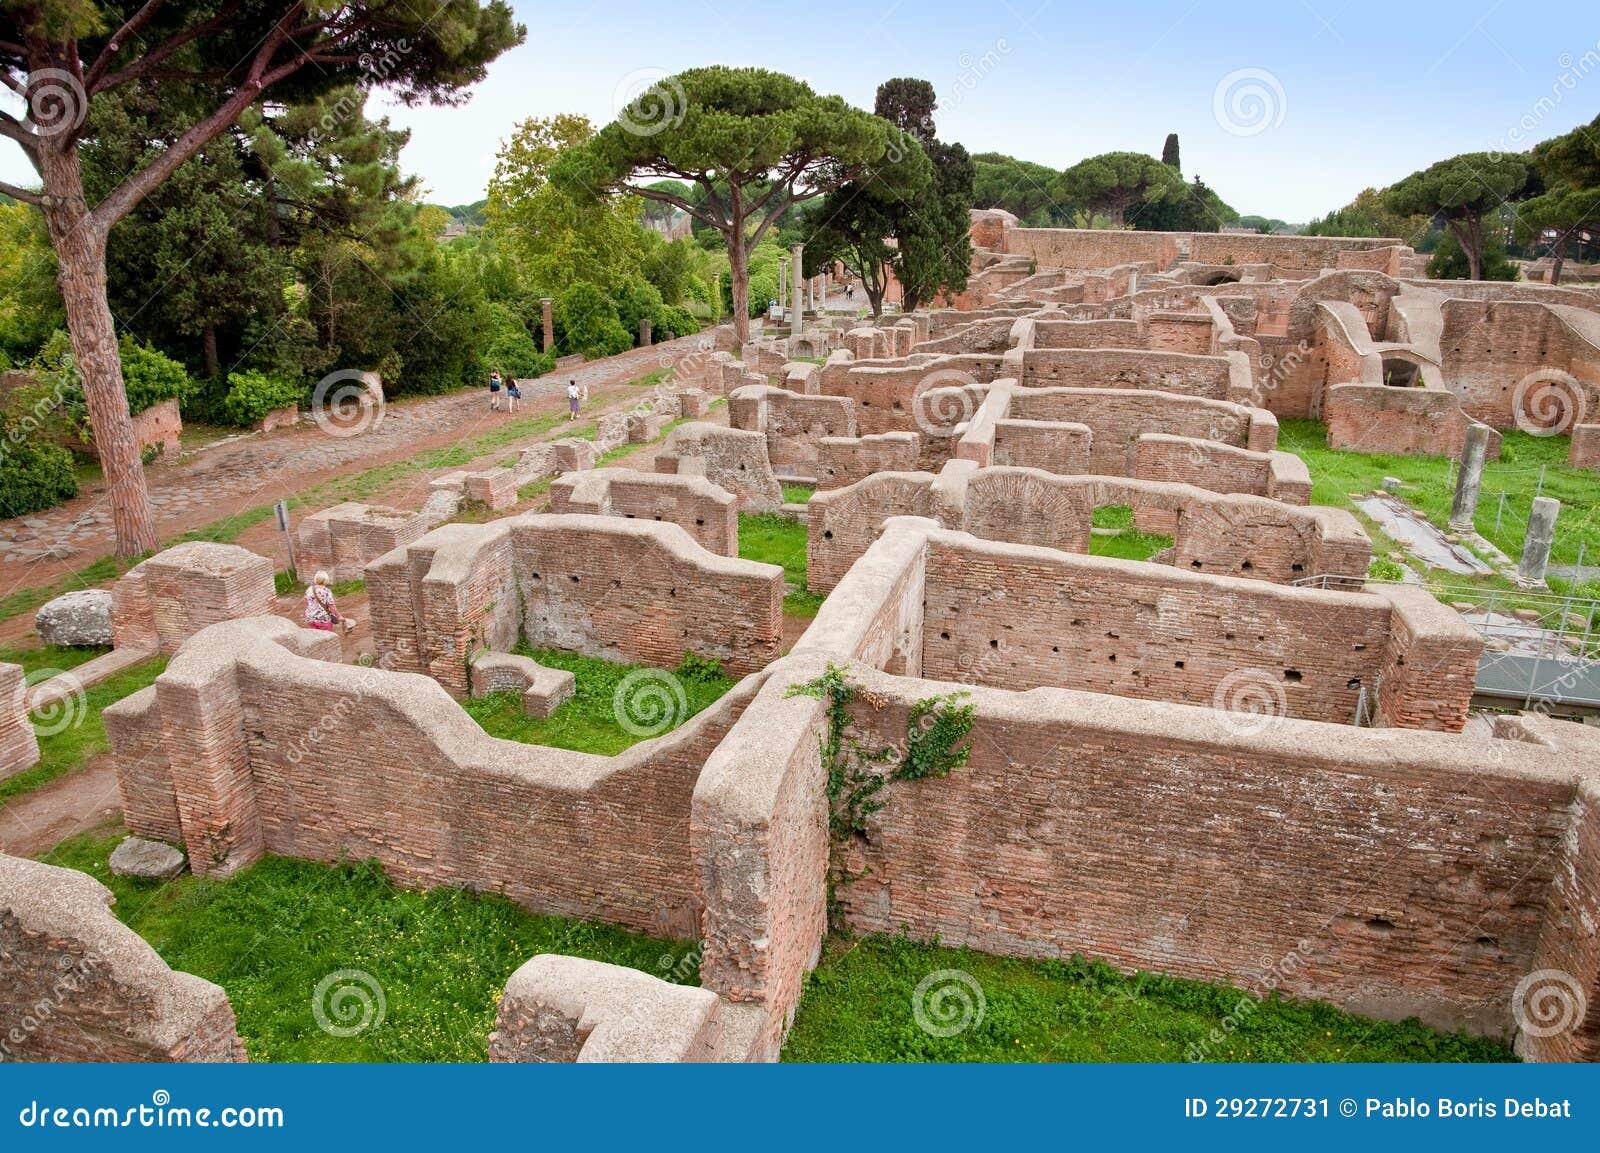 Neptune baths ruins at ostia antica rome stock image for Mr arredamenti ostia antica